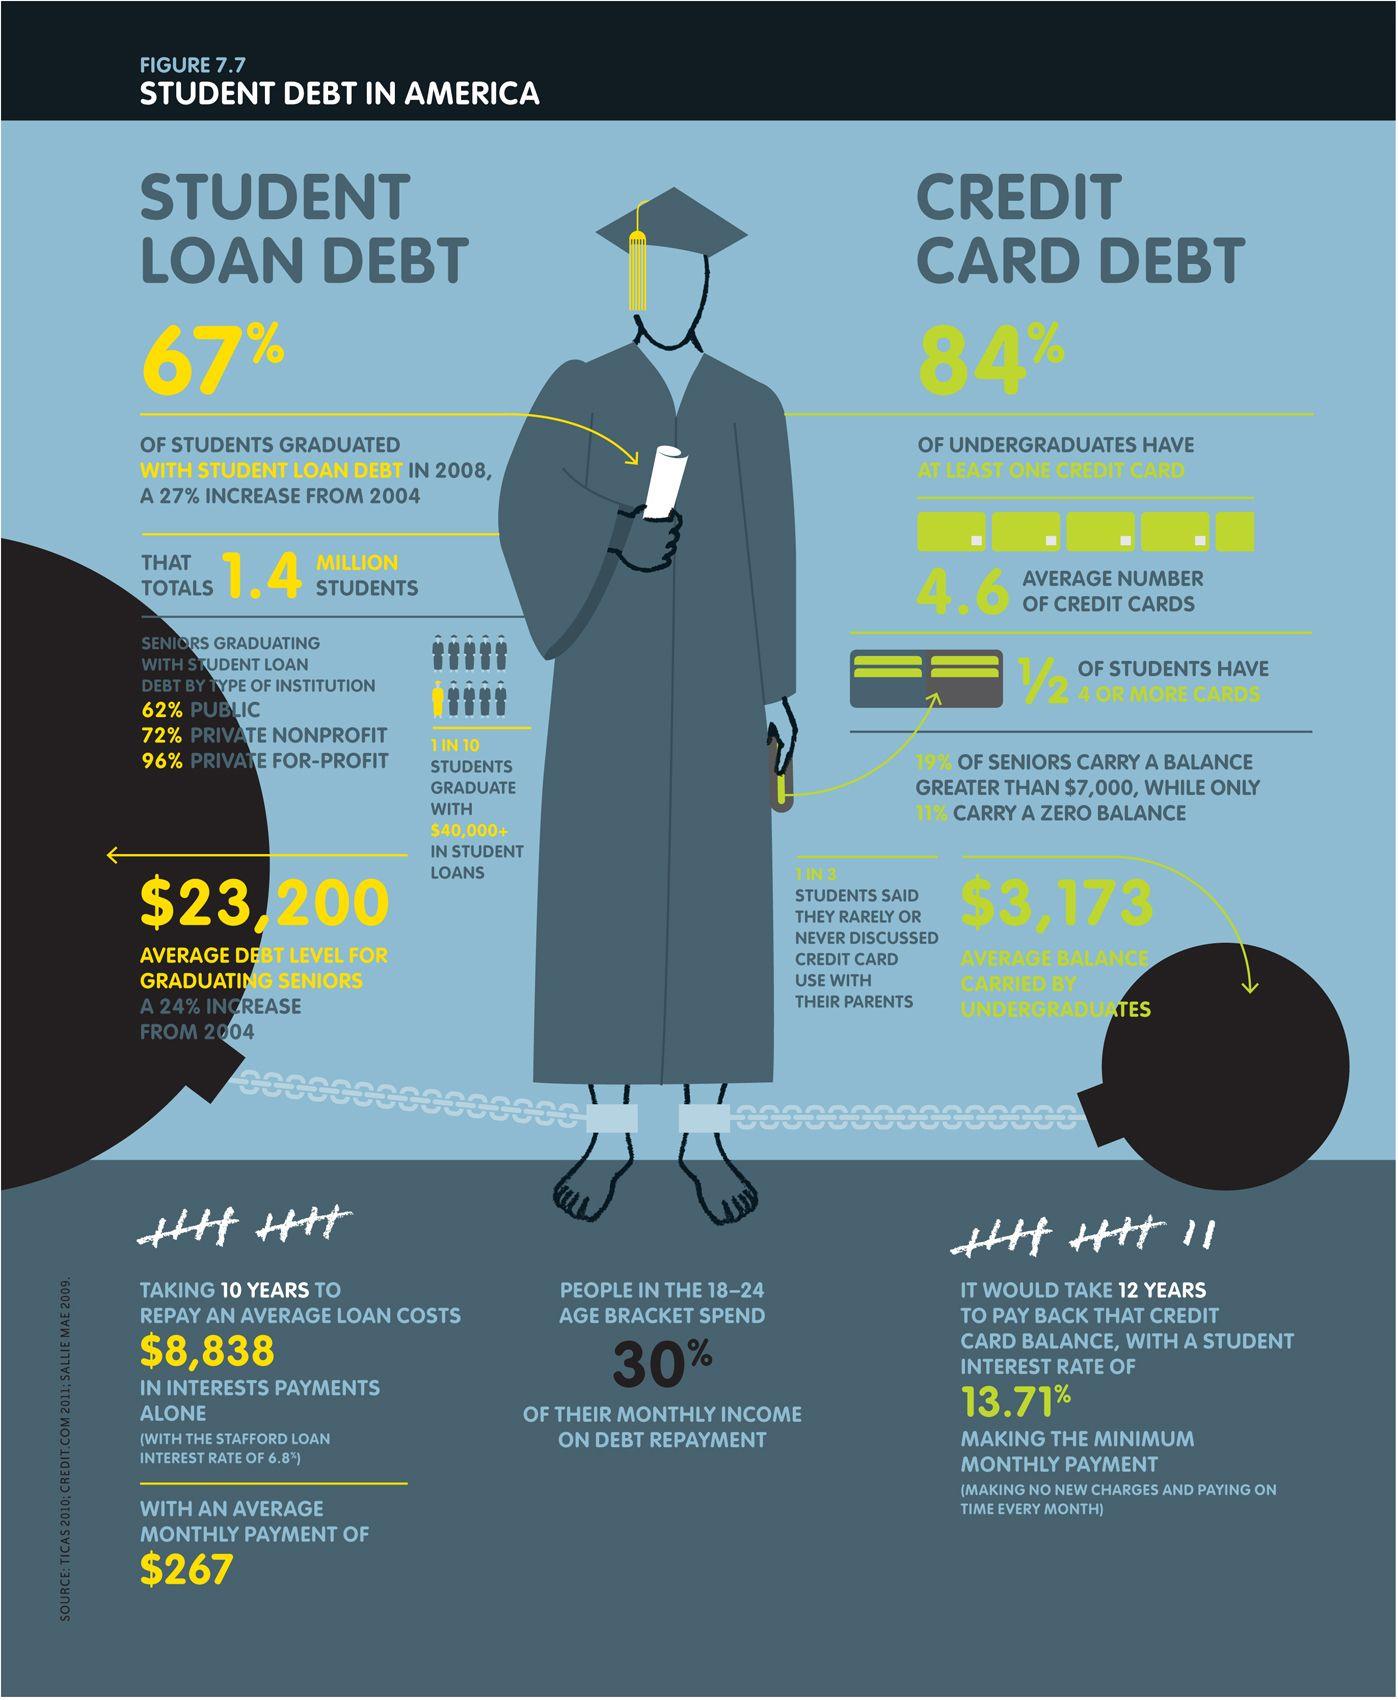 anatomy of school - Google Search   Anatomy of LIU Health   Pinterest   Student loan debt ...